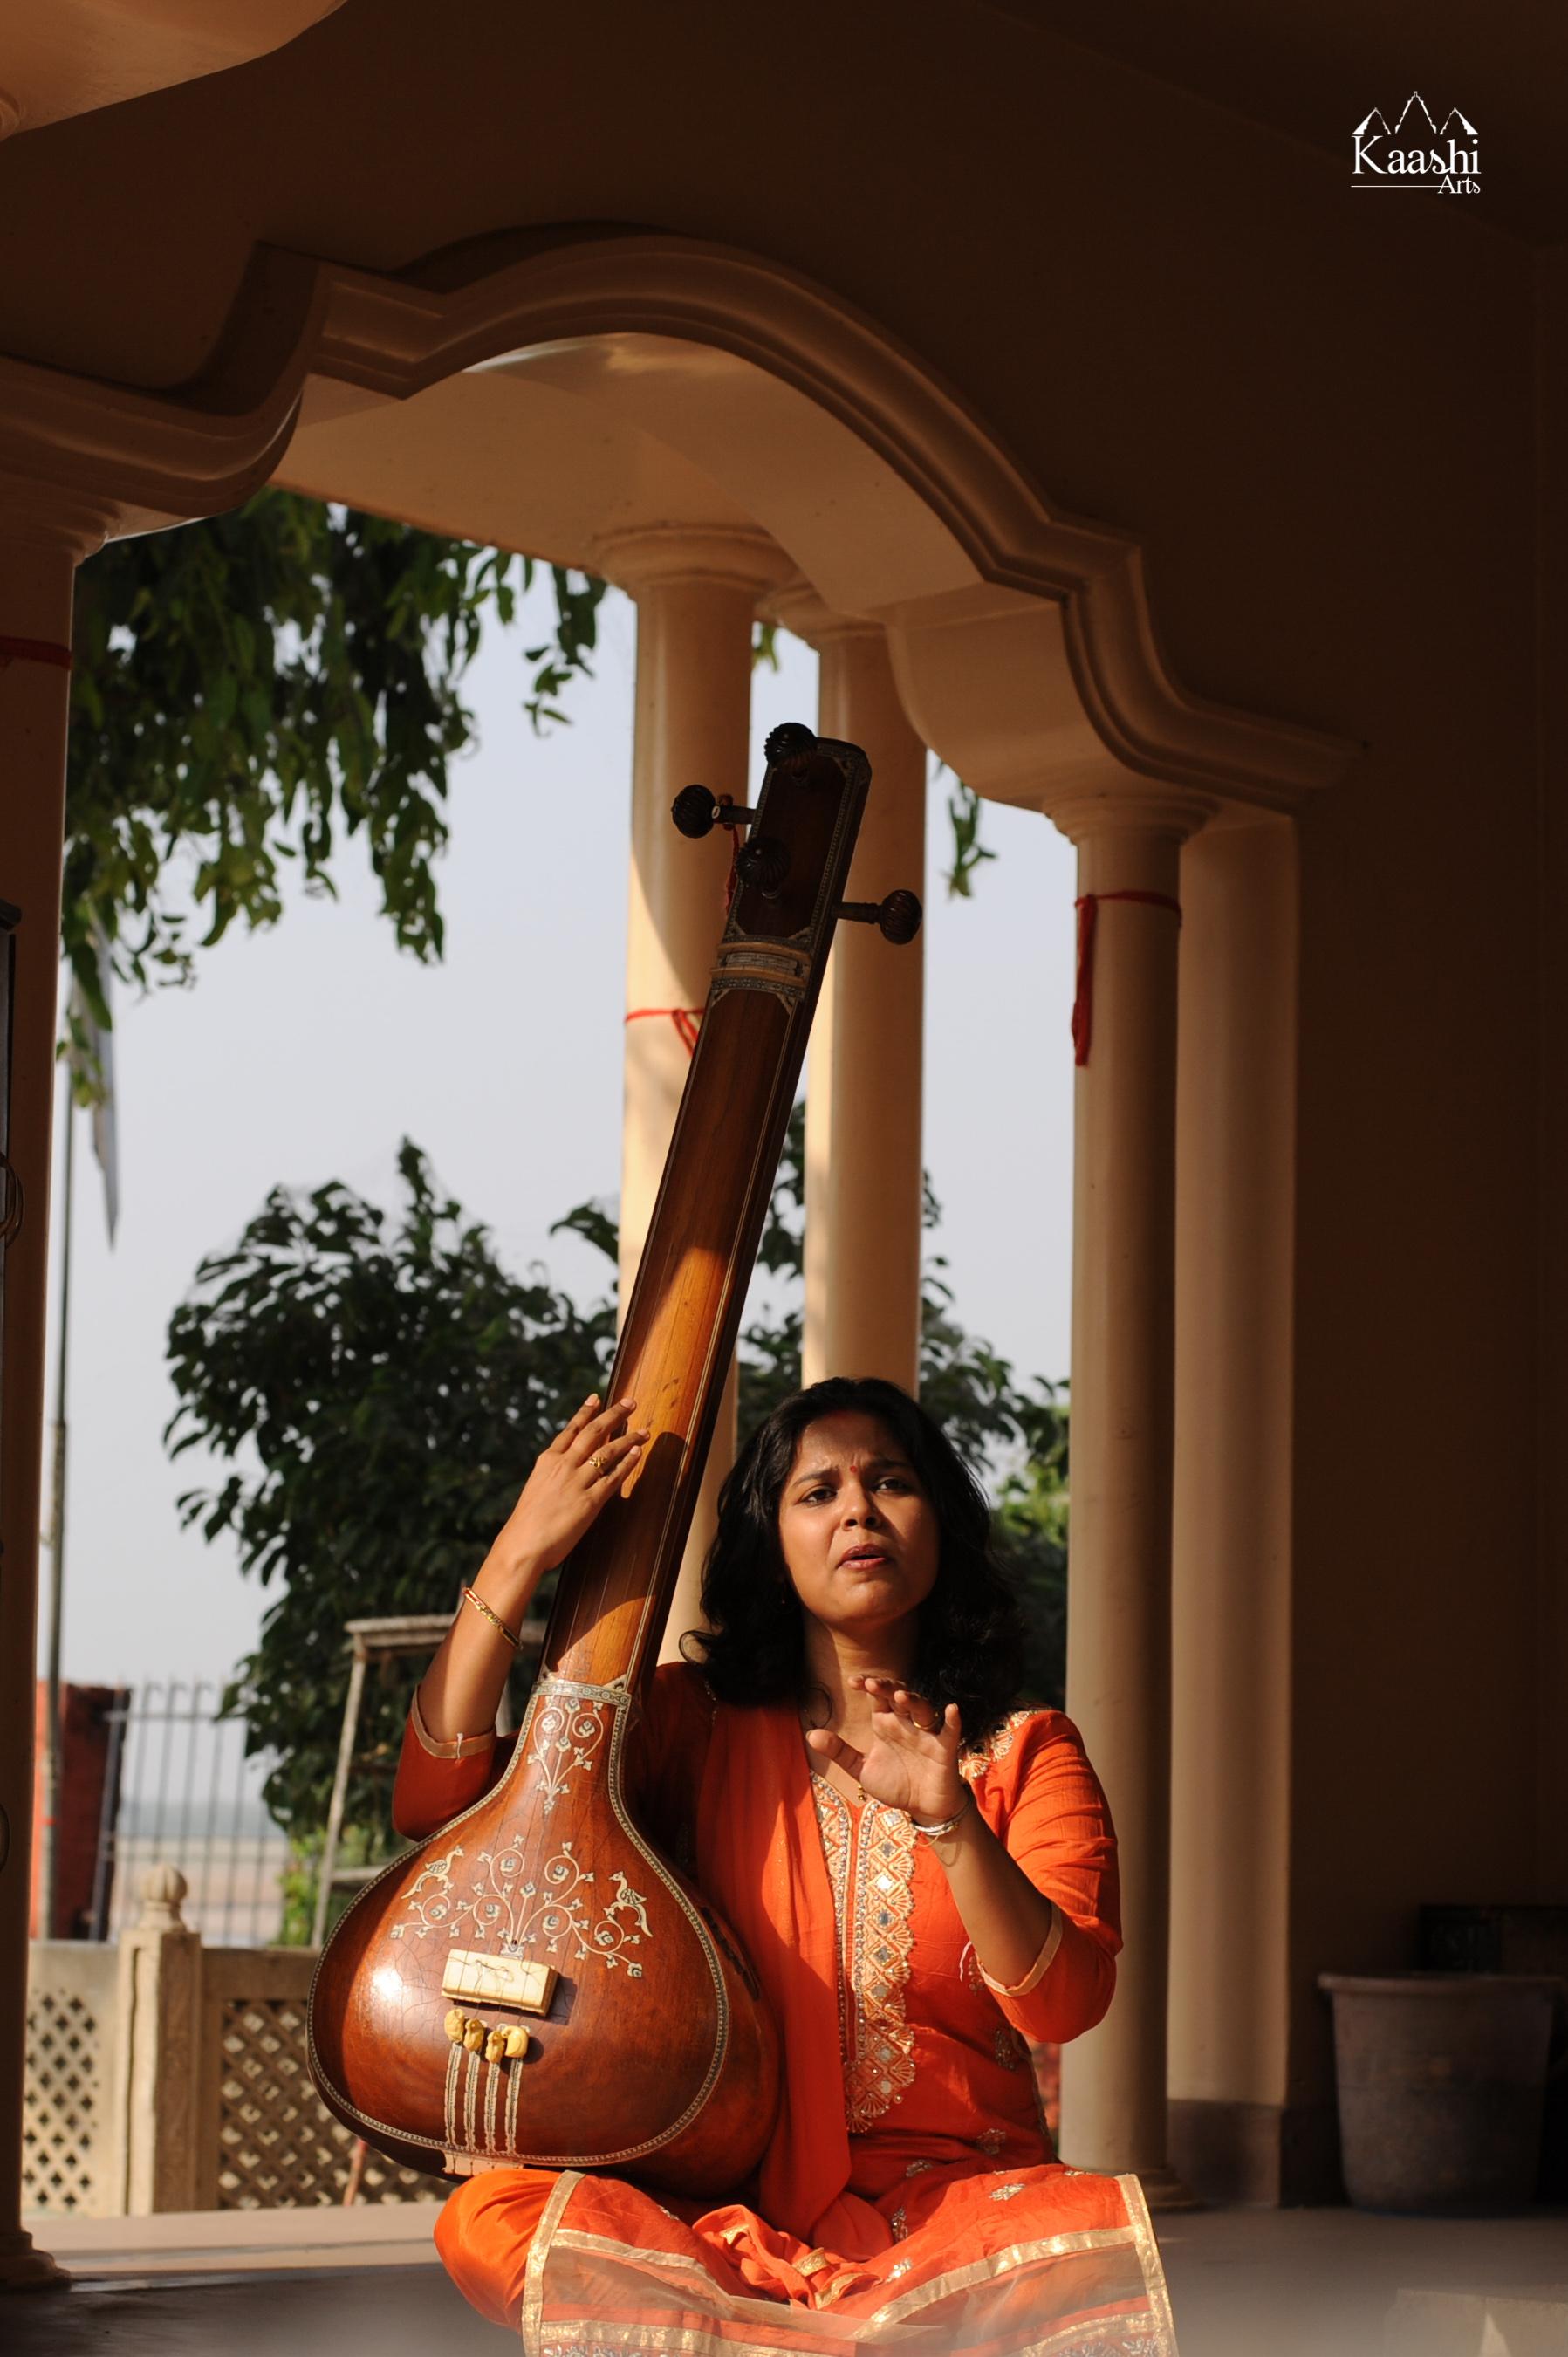 Shalini Prateek Sinha | Senior Disciple of Pandit's Rajan & Sajan Mishra ji of Varanasi